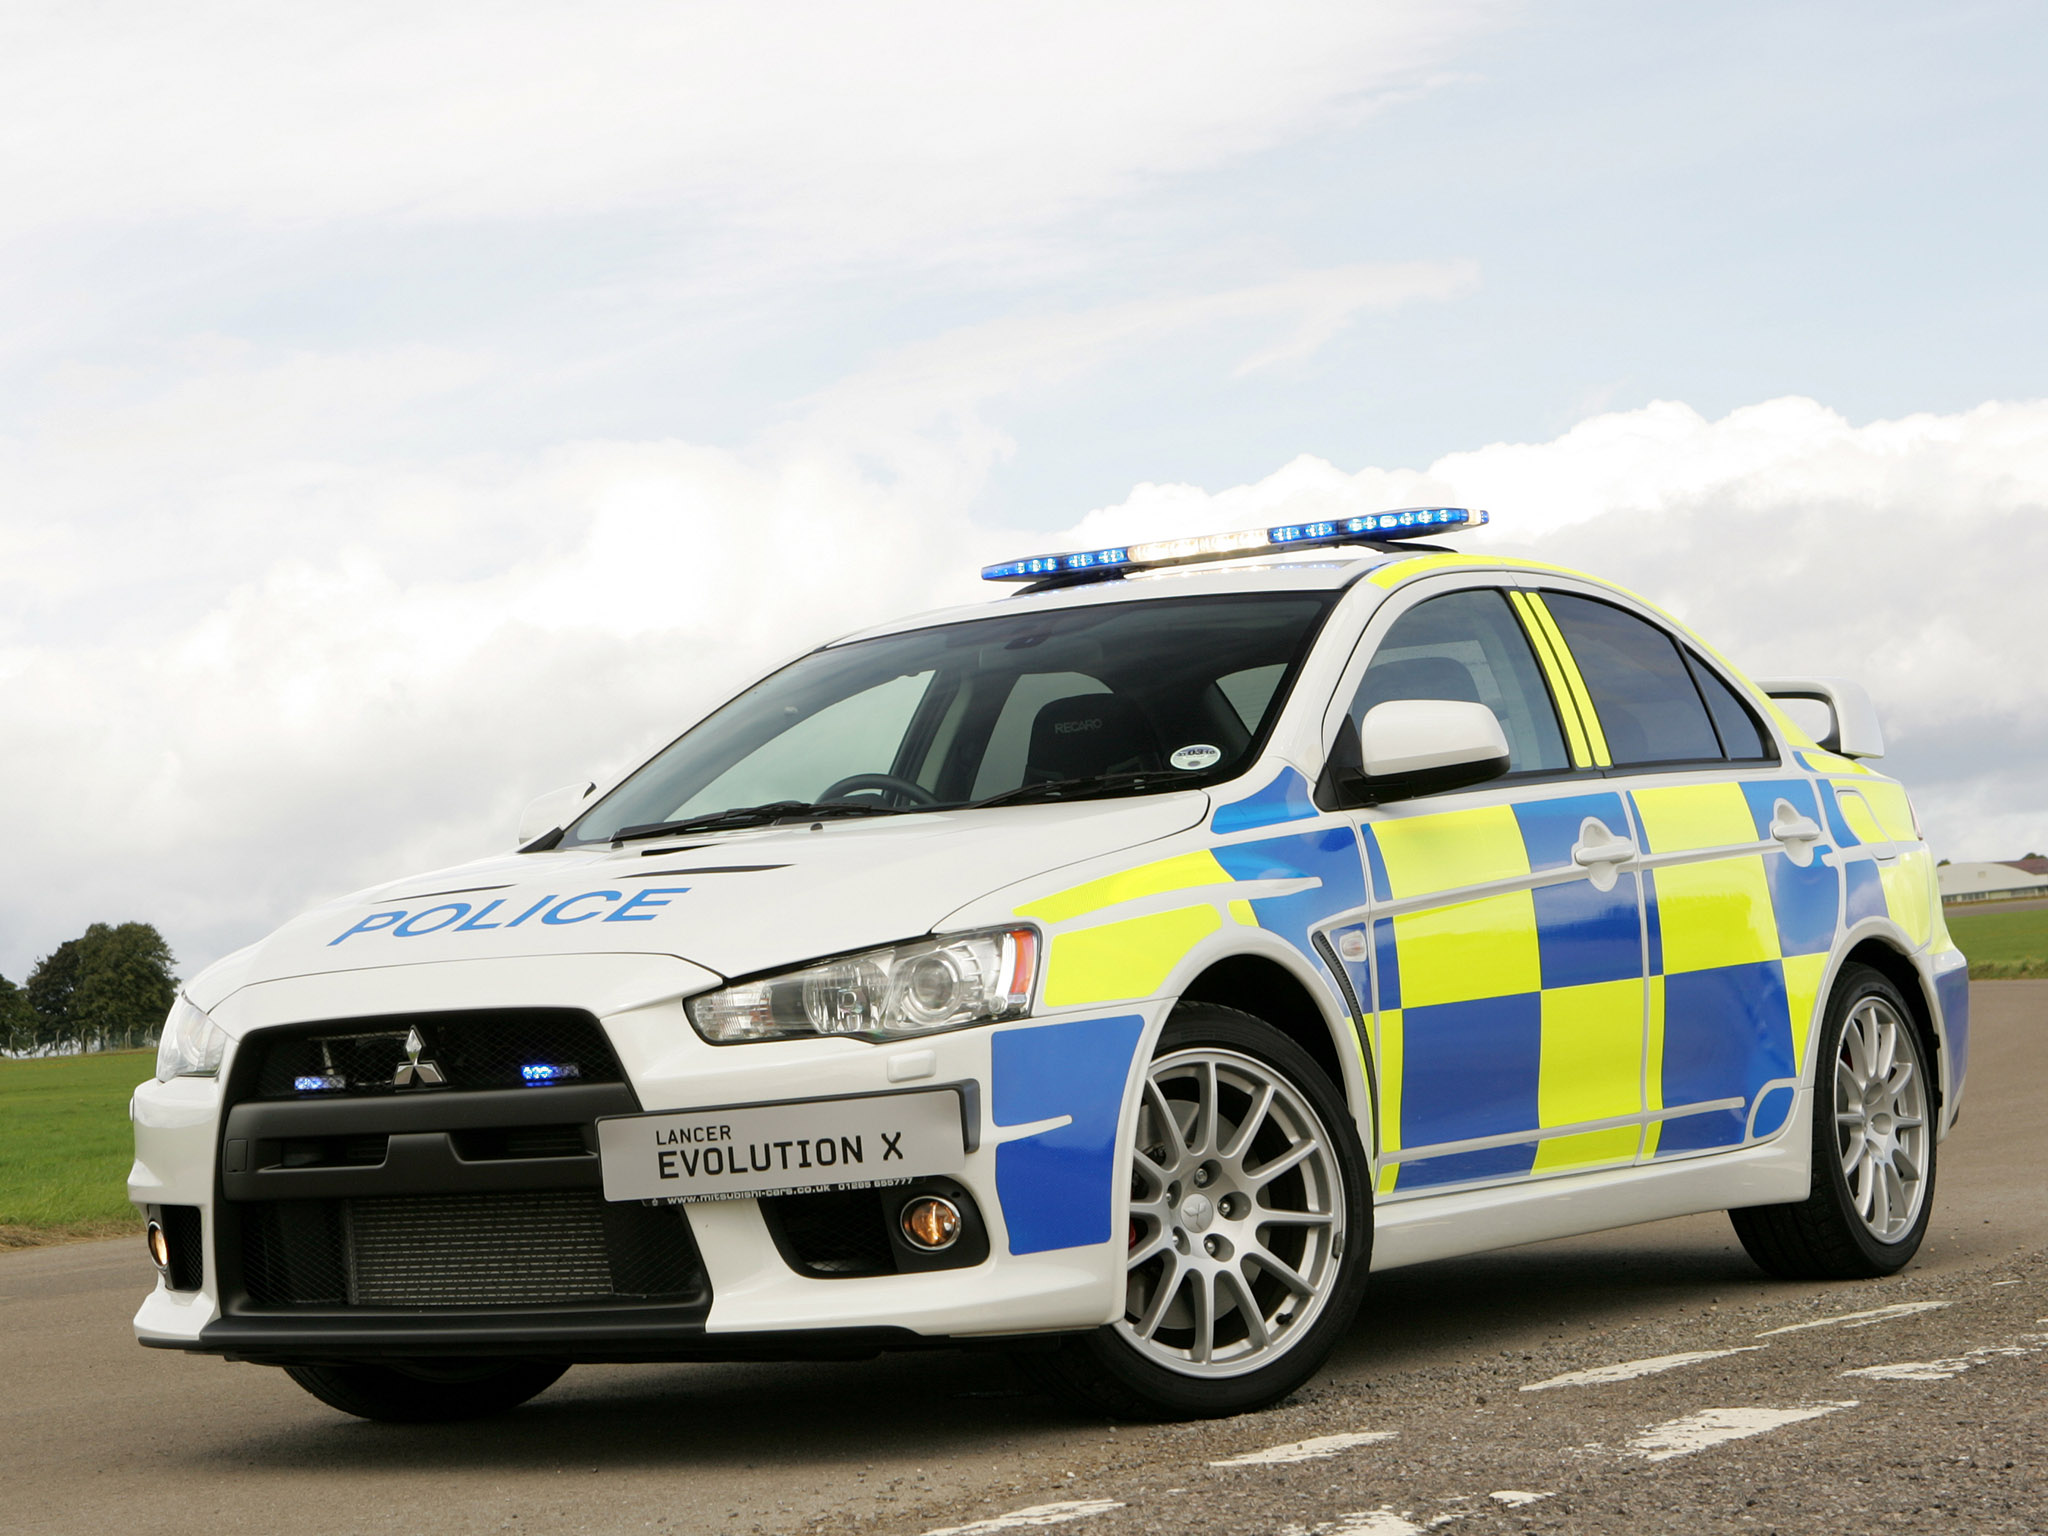 Mitsubishi Lancer Evolution X Police Edition Wallpapers | Car Walls